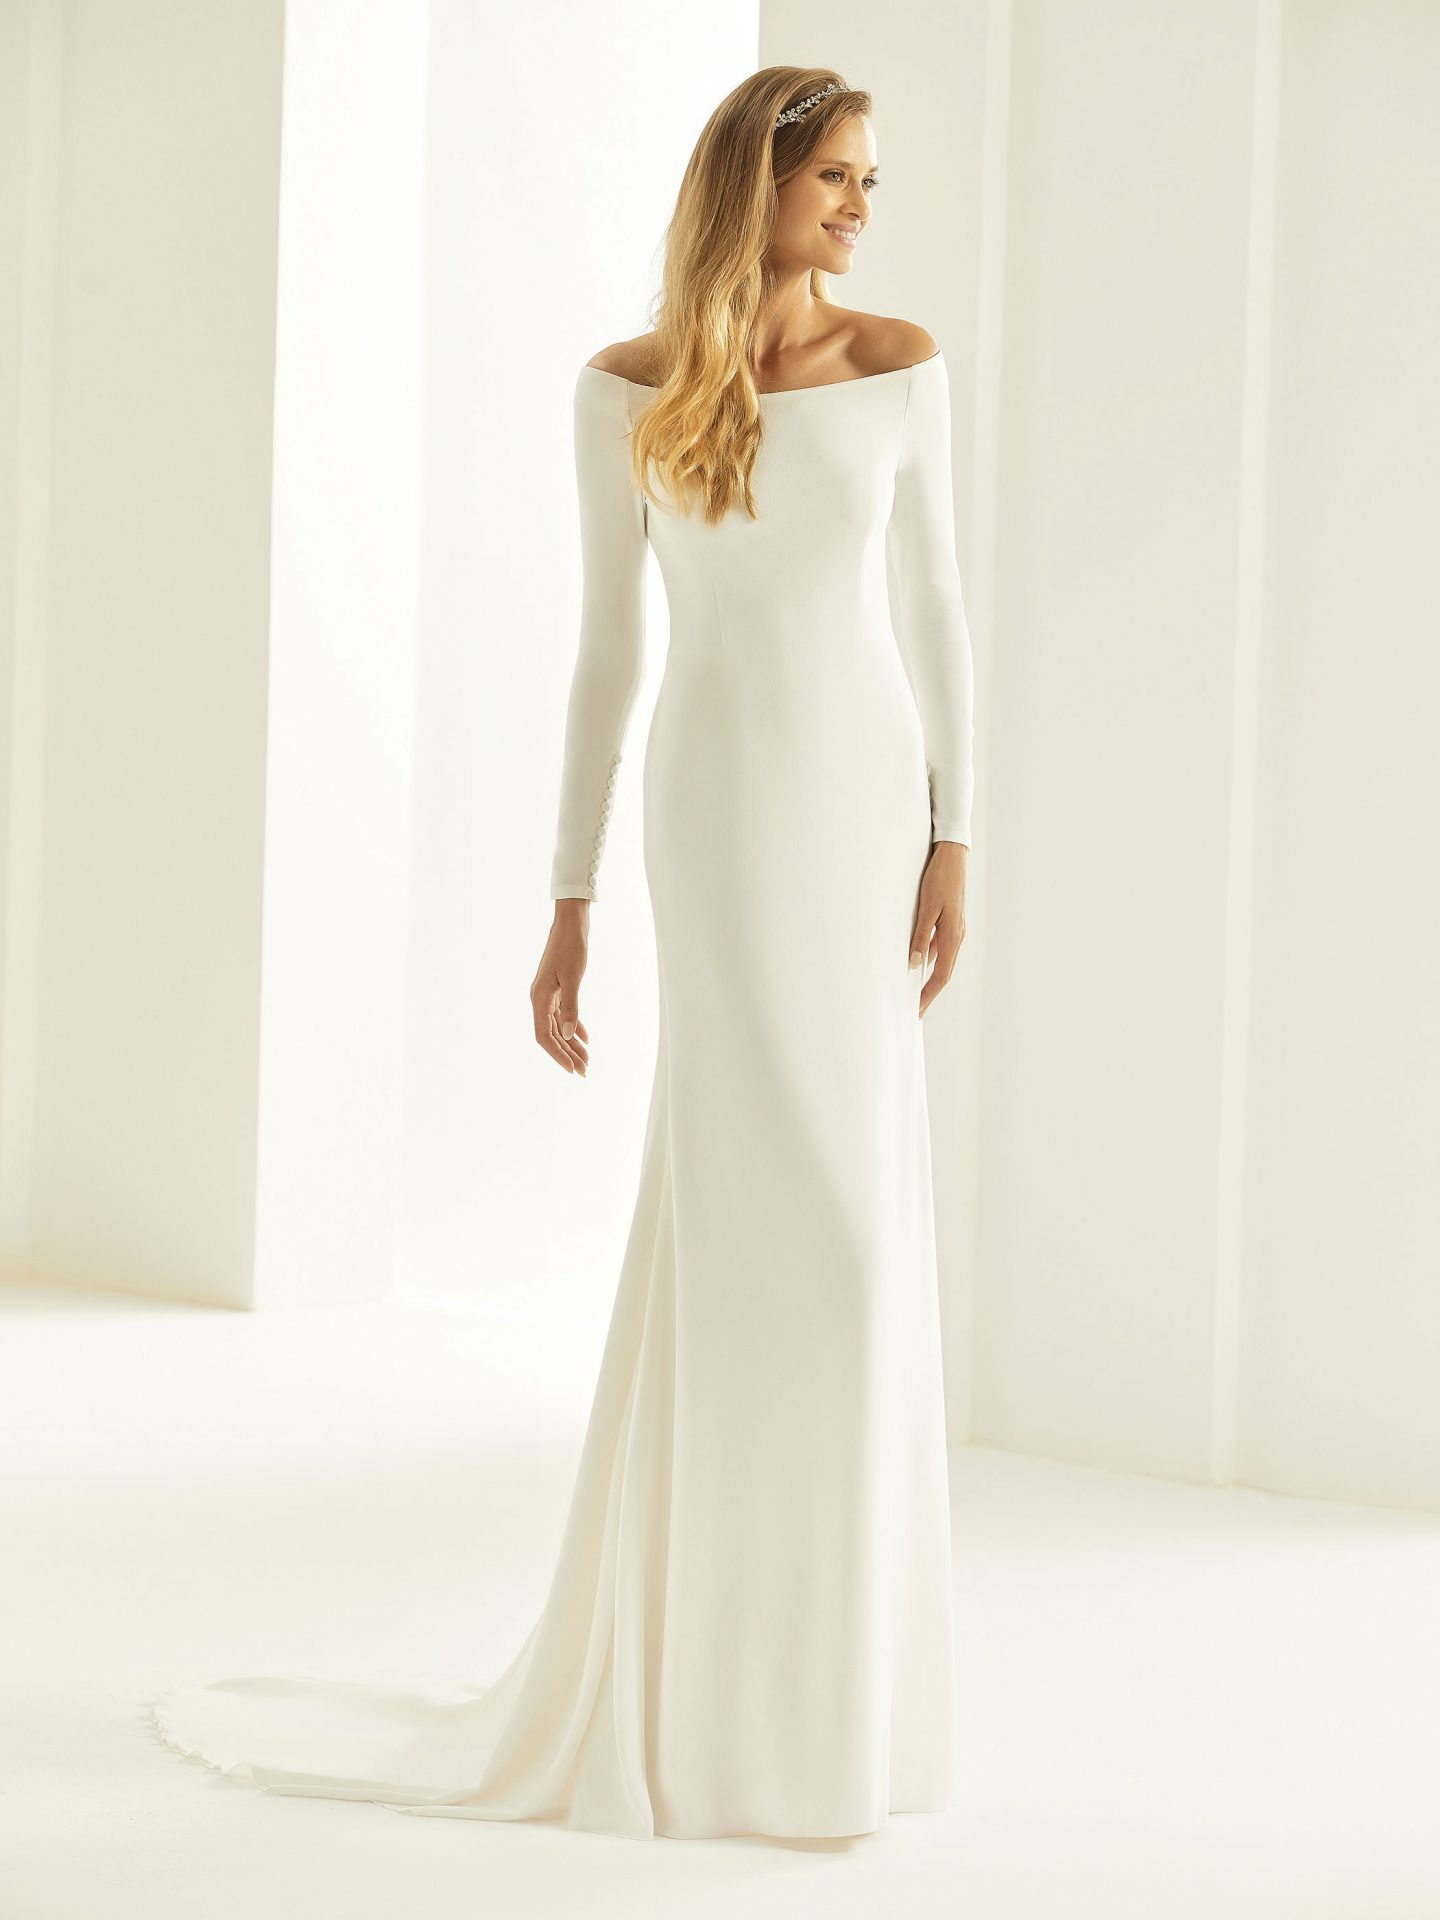 Say Yes De Mooiste Sustainable Bruidsjurken Good For